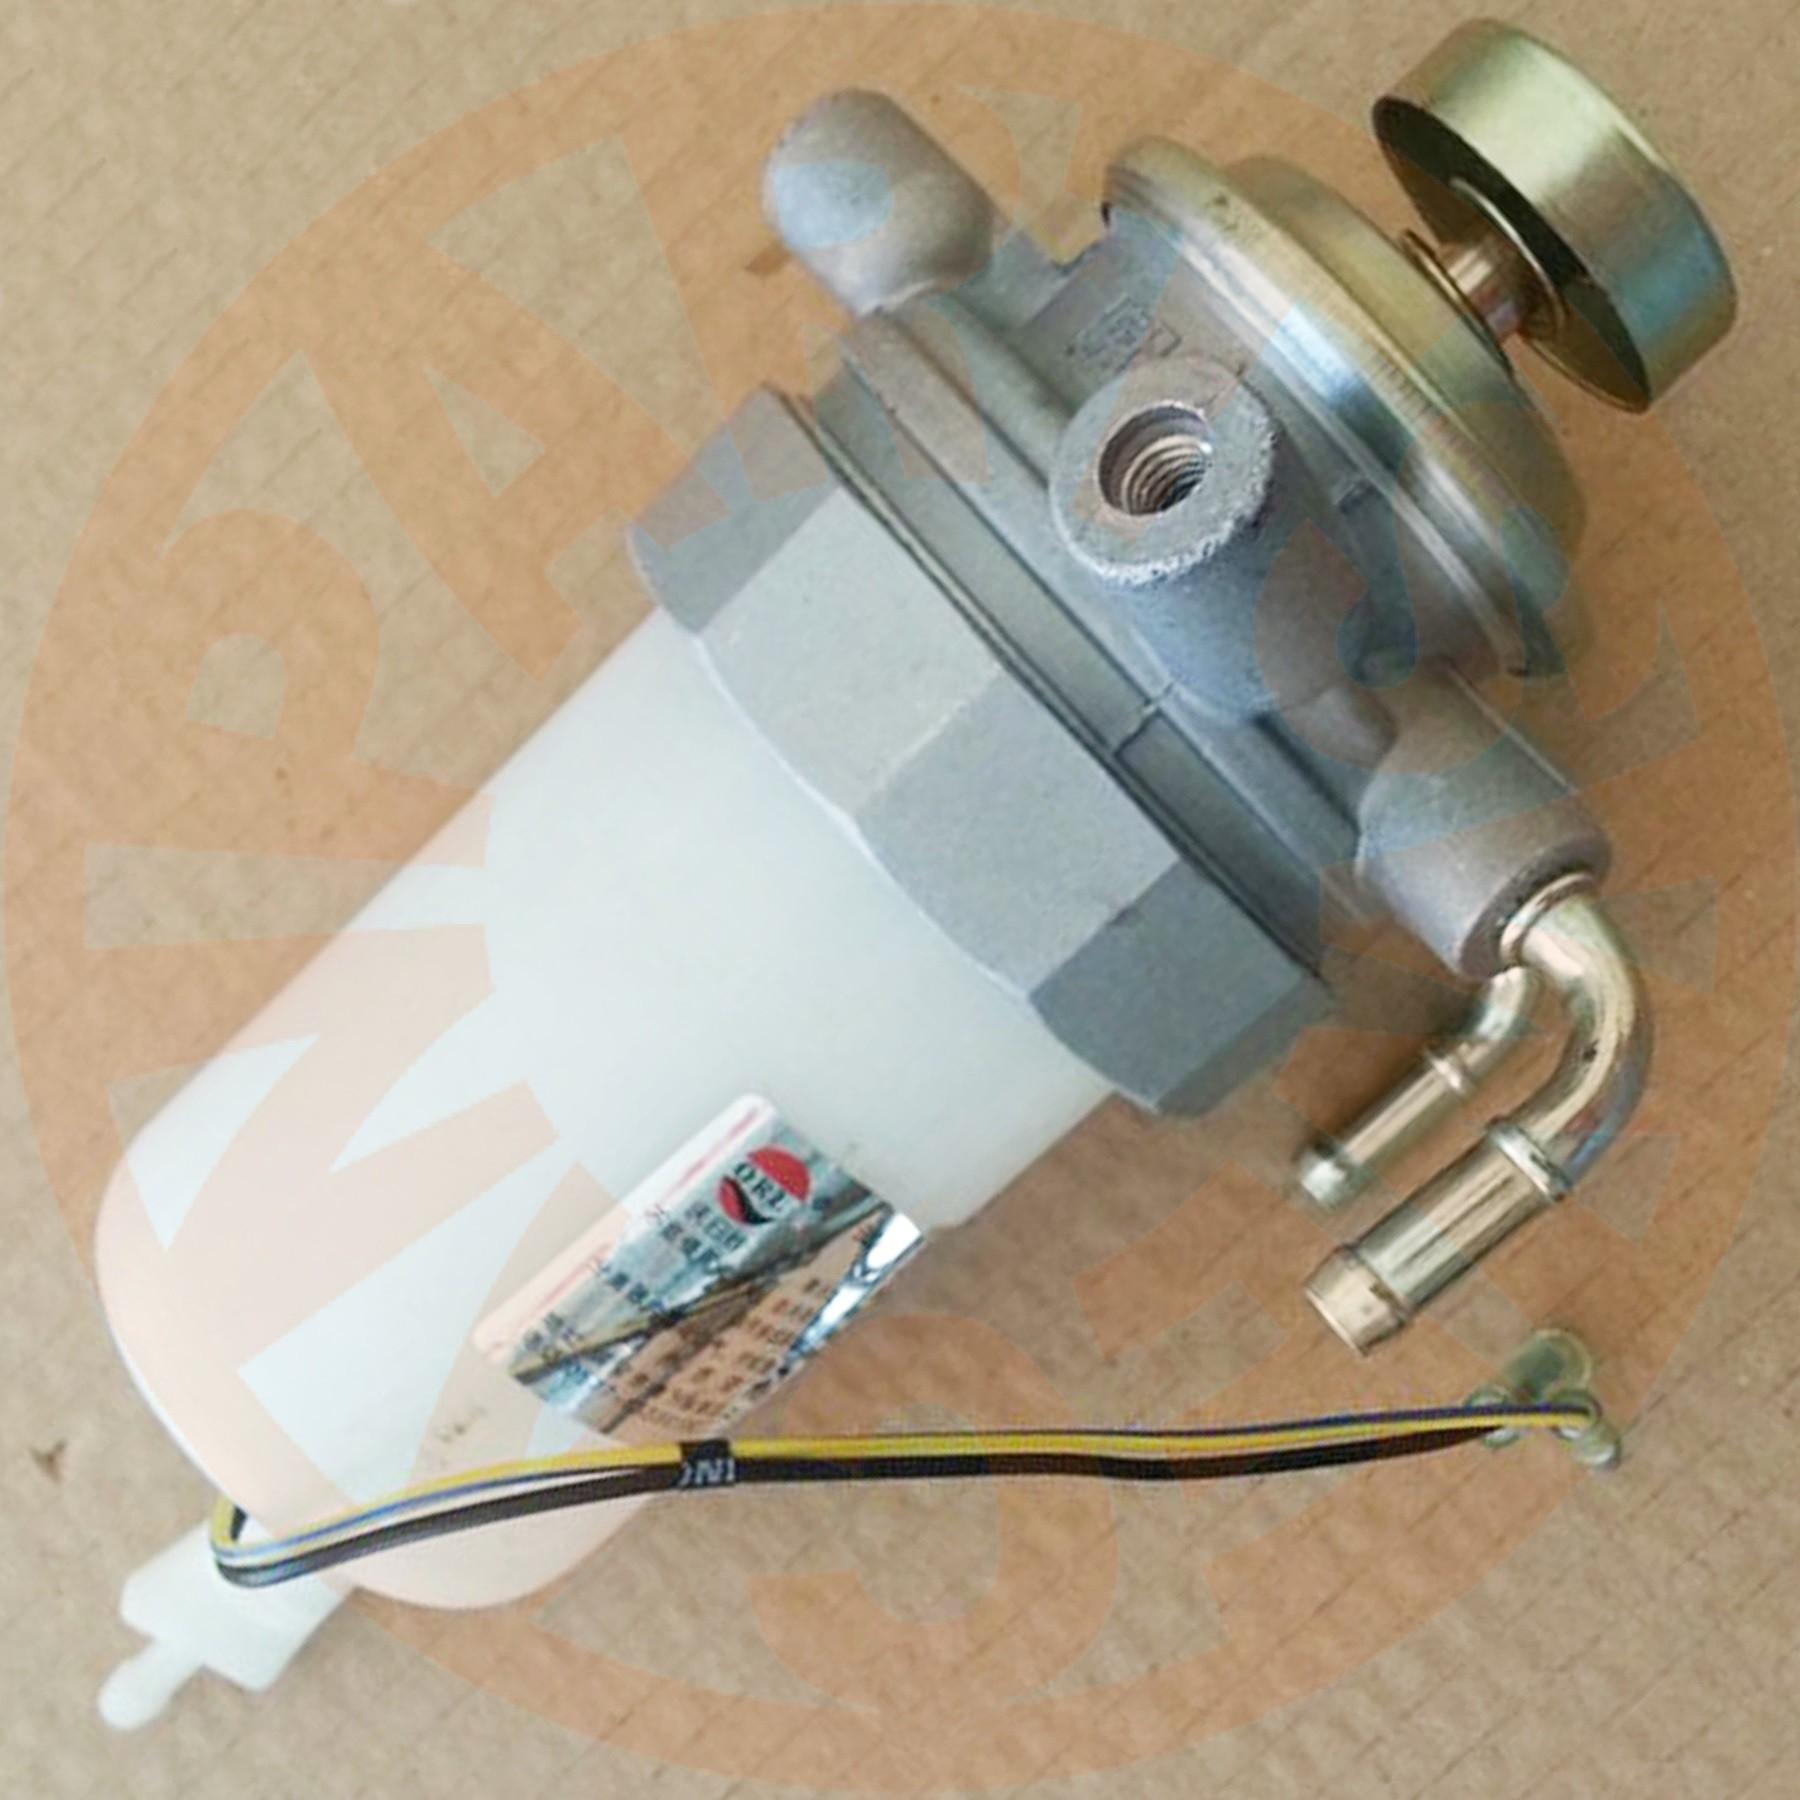 FUEL FILTER ASSY ISUZU 4JB1 ENGINE PICKUP TRUCK AFTERMARKET PARTS  5-13200220-9